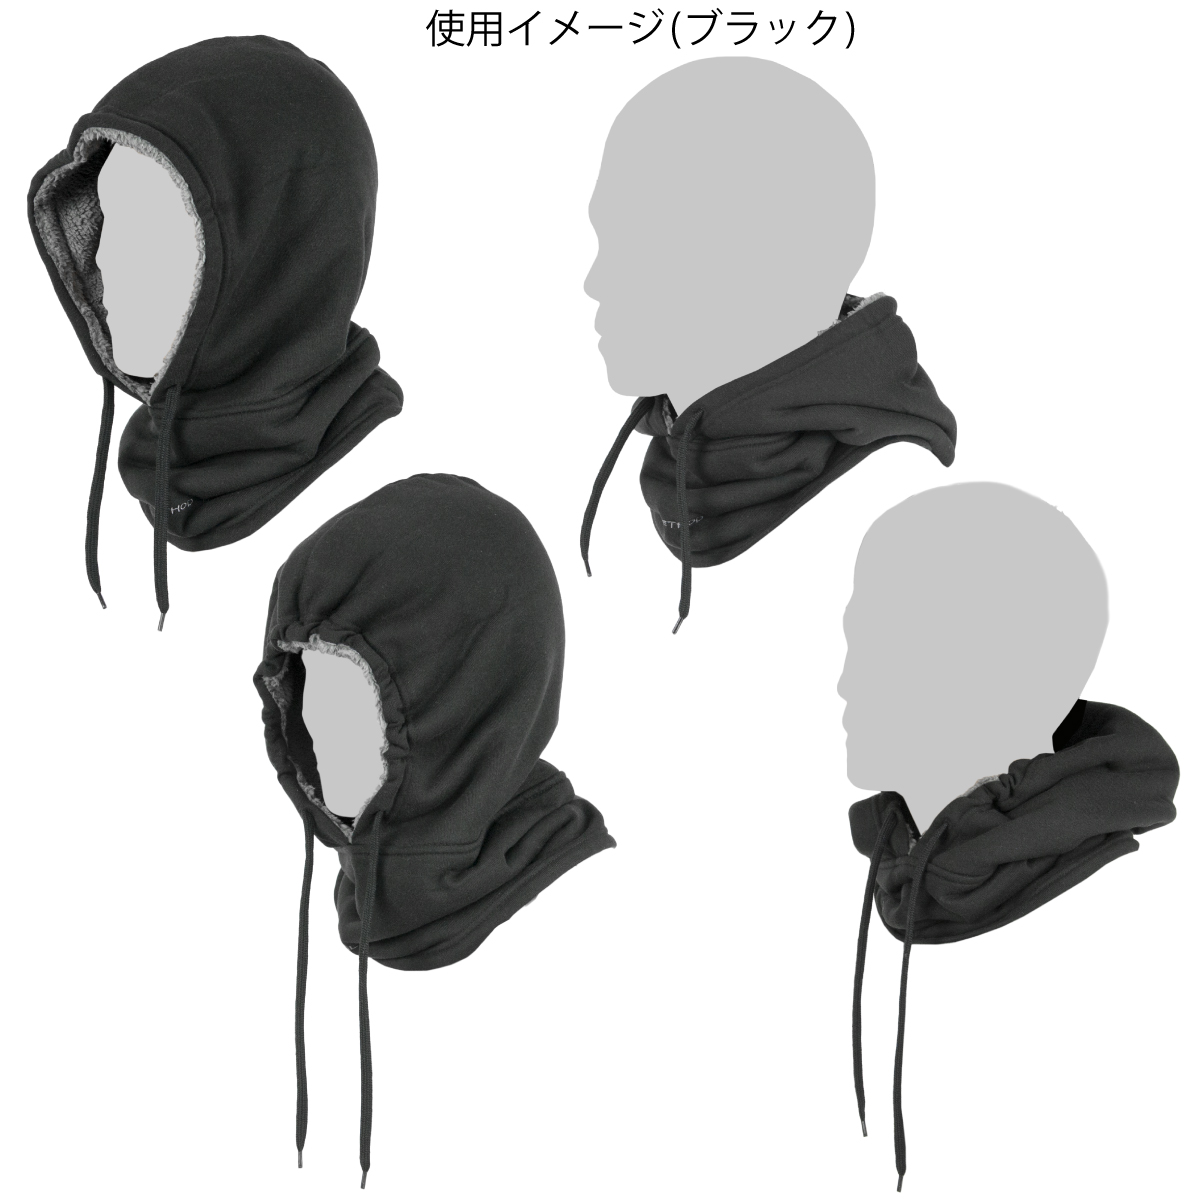 Back raising neck warmer F sargasso with the Takamiya REALMETHOD food is gray